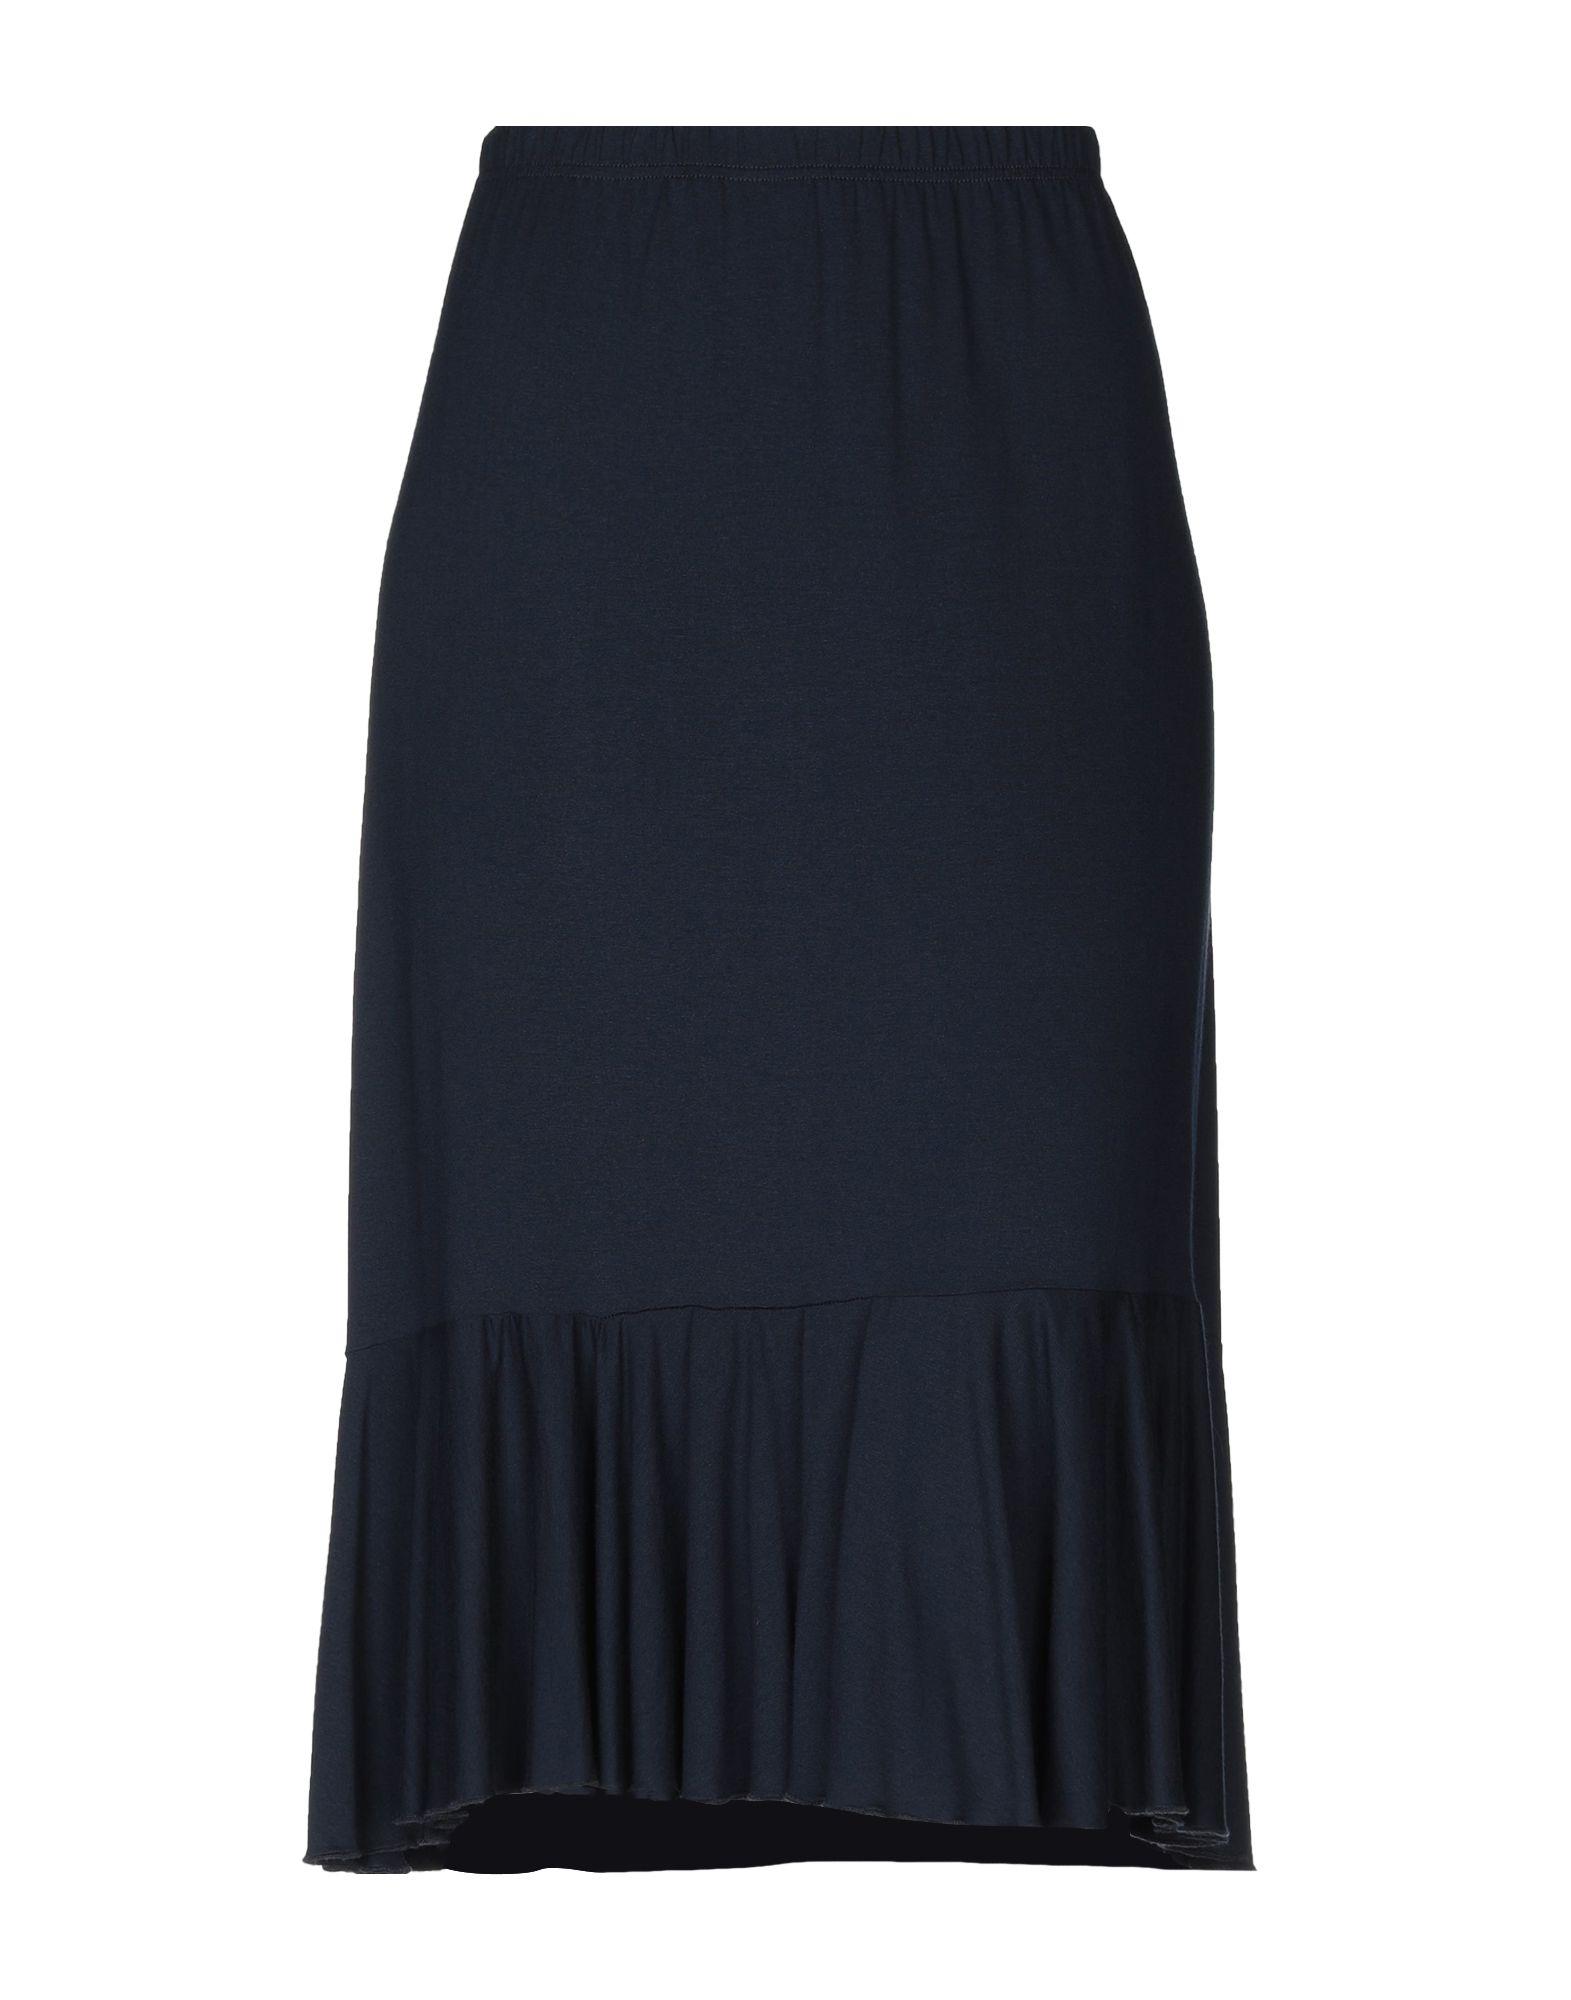 Фото - BARONESS Юбка длиной 3/4 baroness пиджак